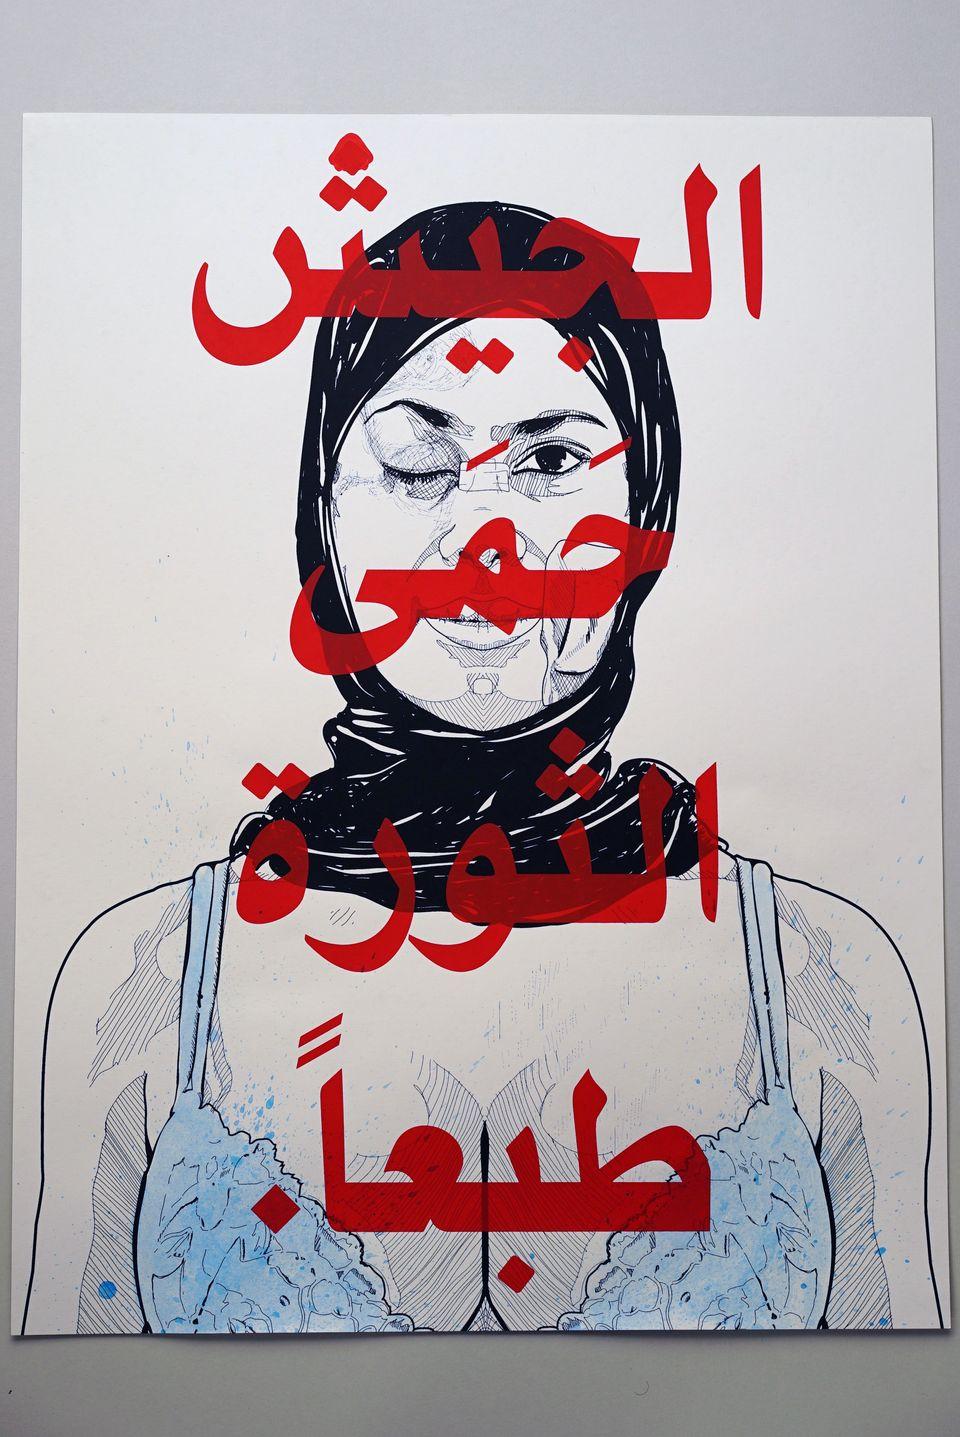 Ganzeer's work is sharply political. This piece, titled